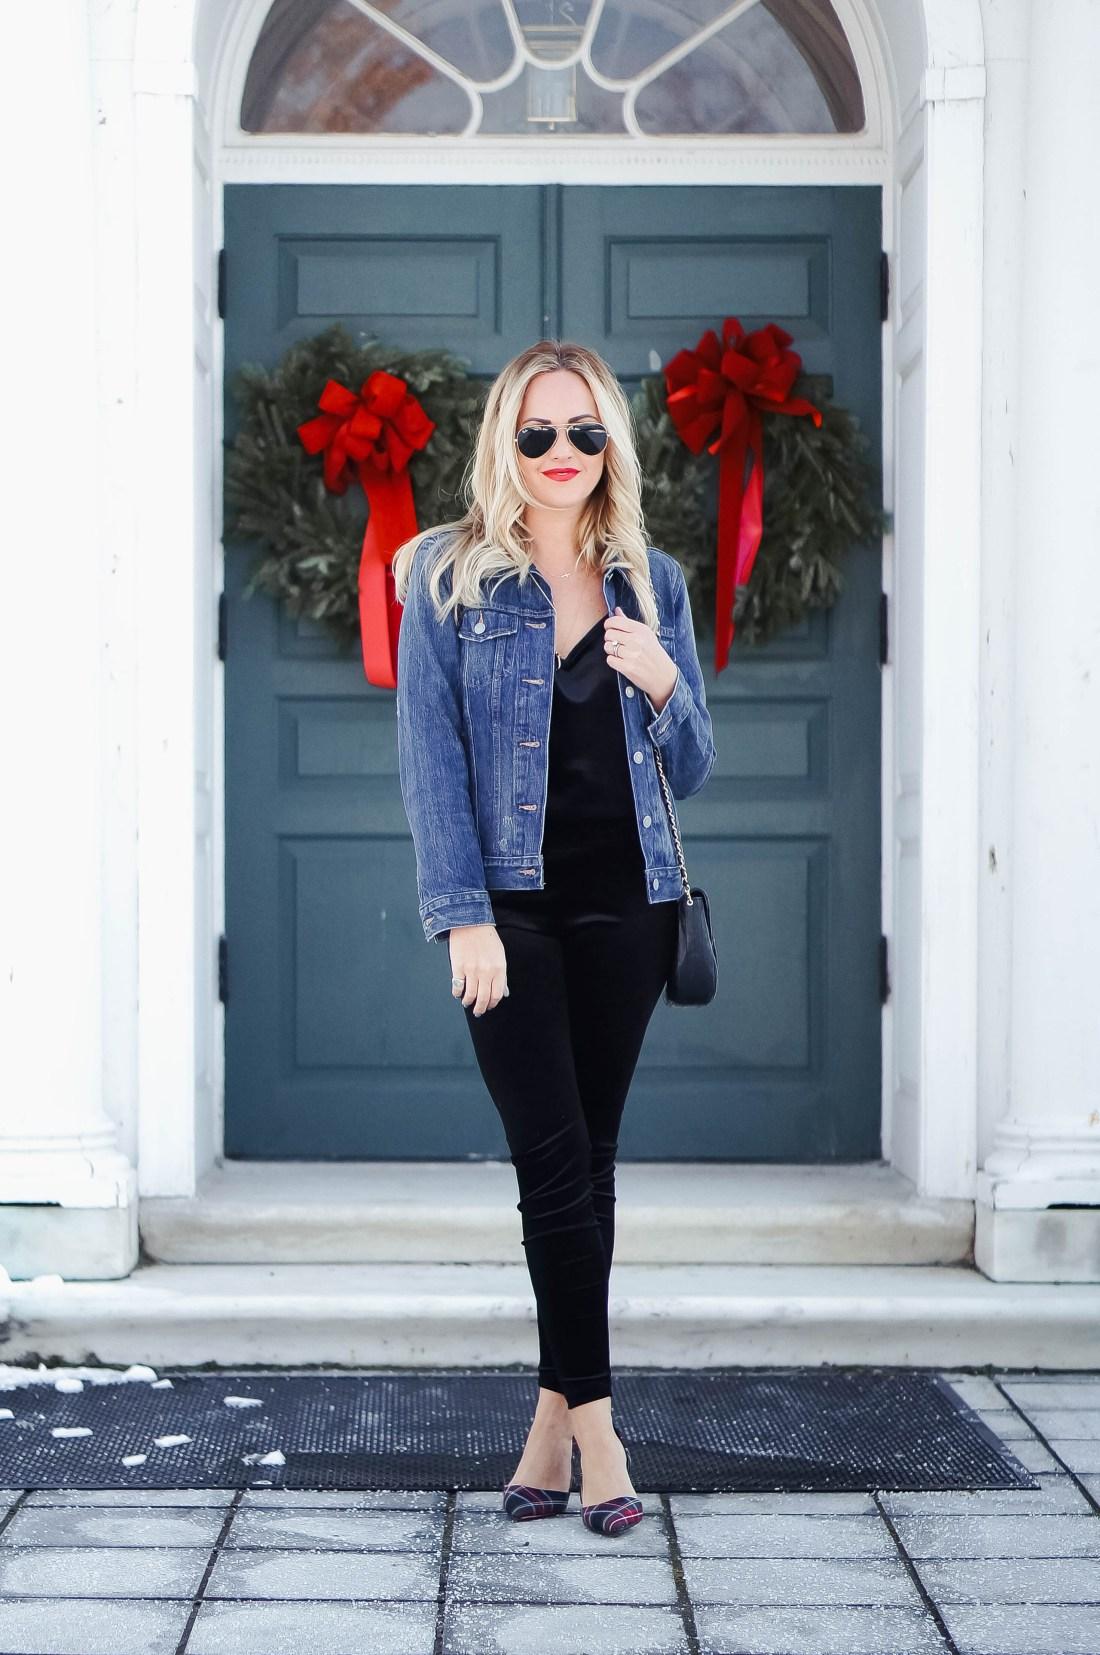 Velvet And Denim Outfit Idea